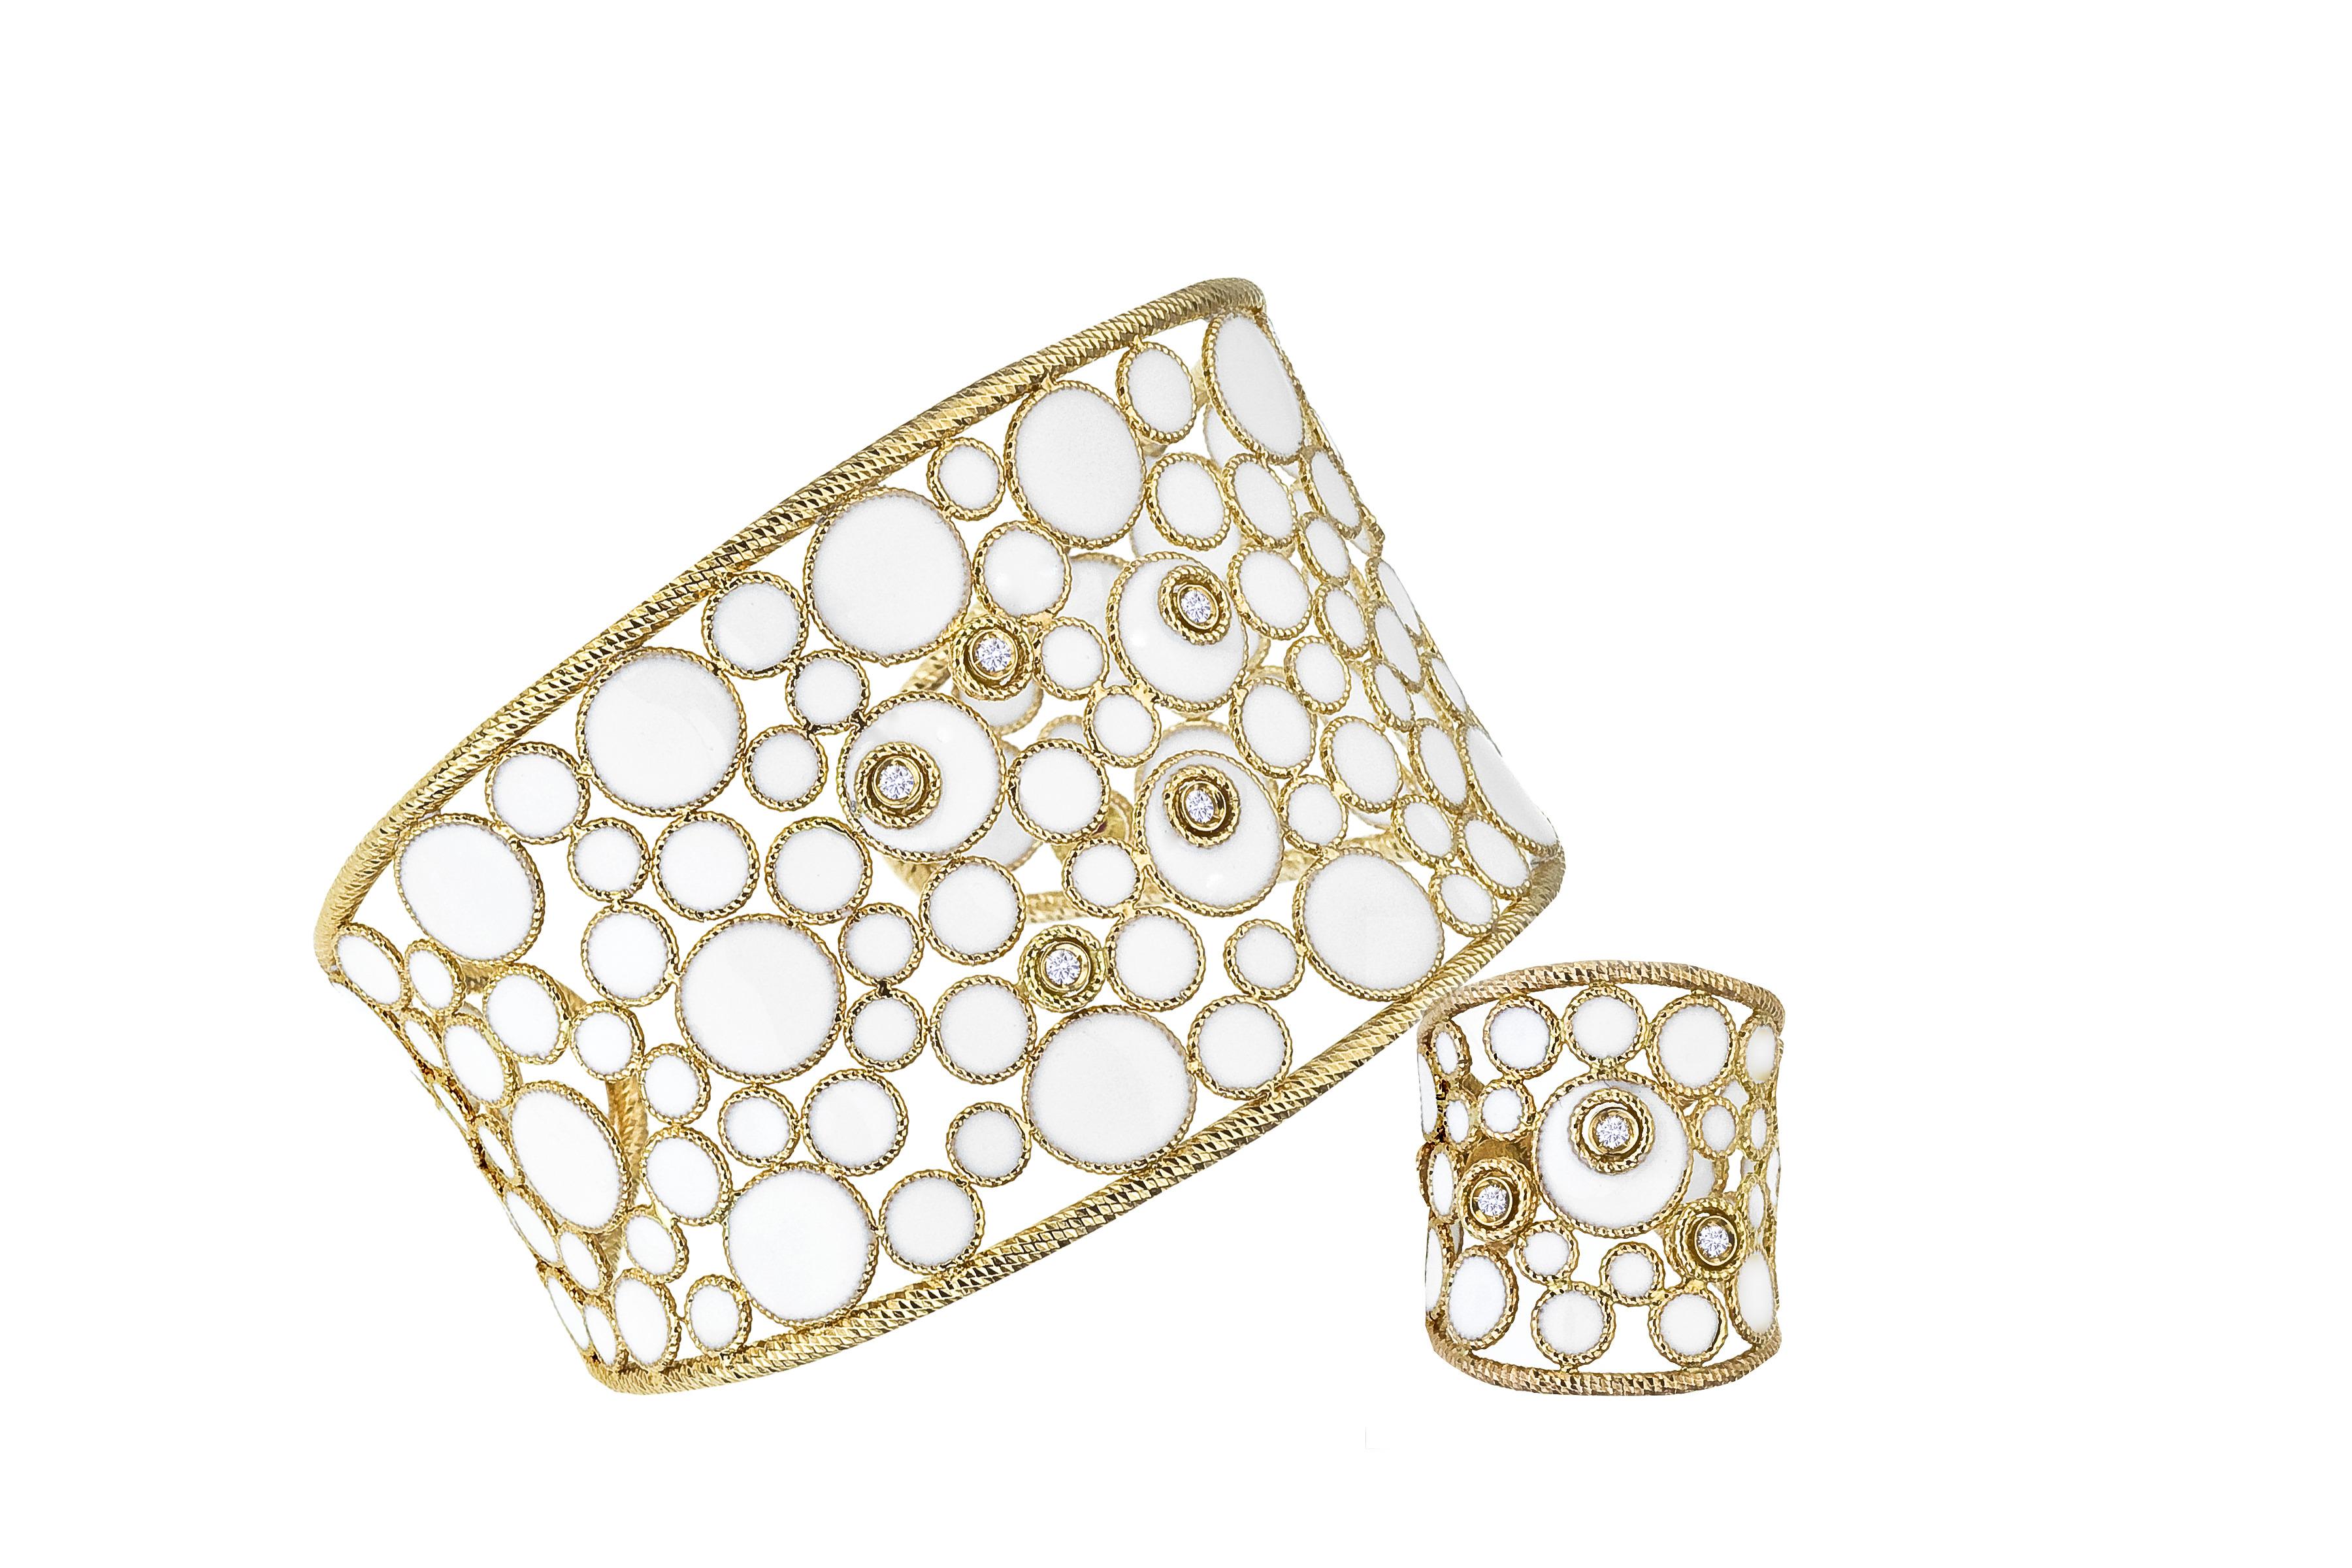 50ef37f5e606c61d77aa_004_Roberto_Coin_Bollicine_Enamel_Diamonds.jpg